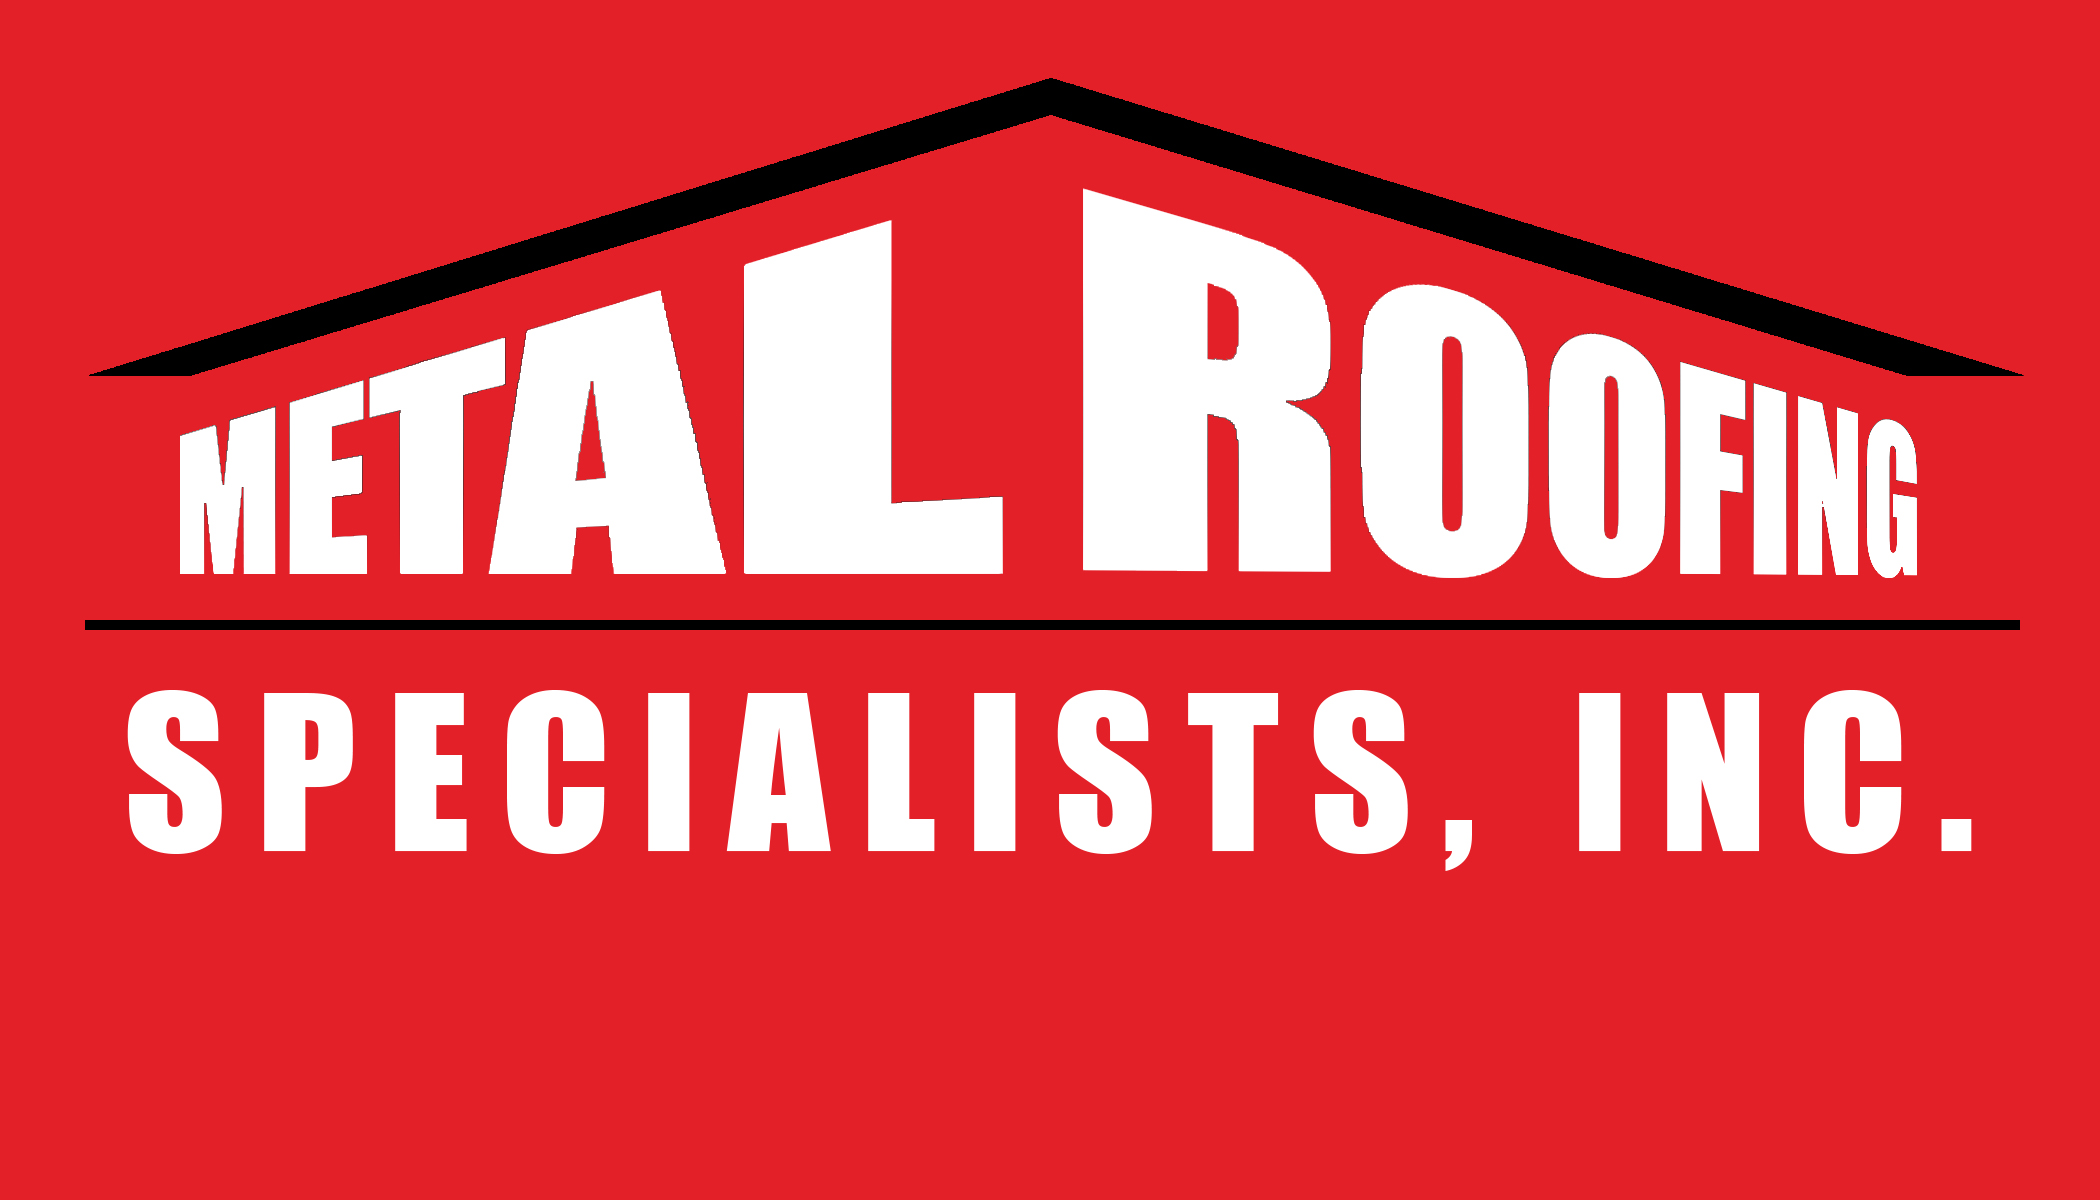 Metal Roofing Specialist